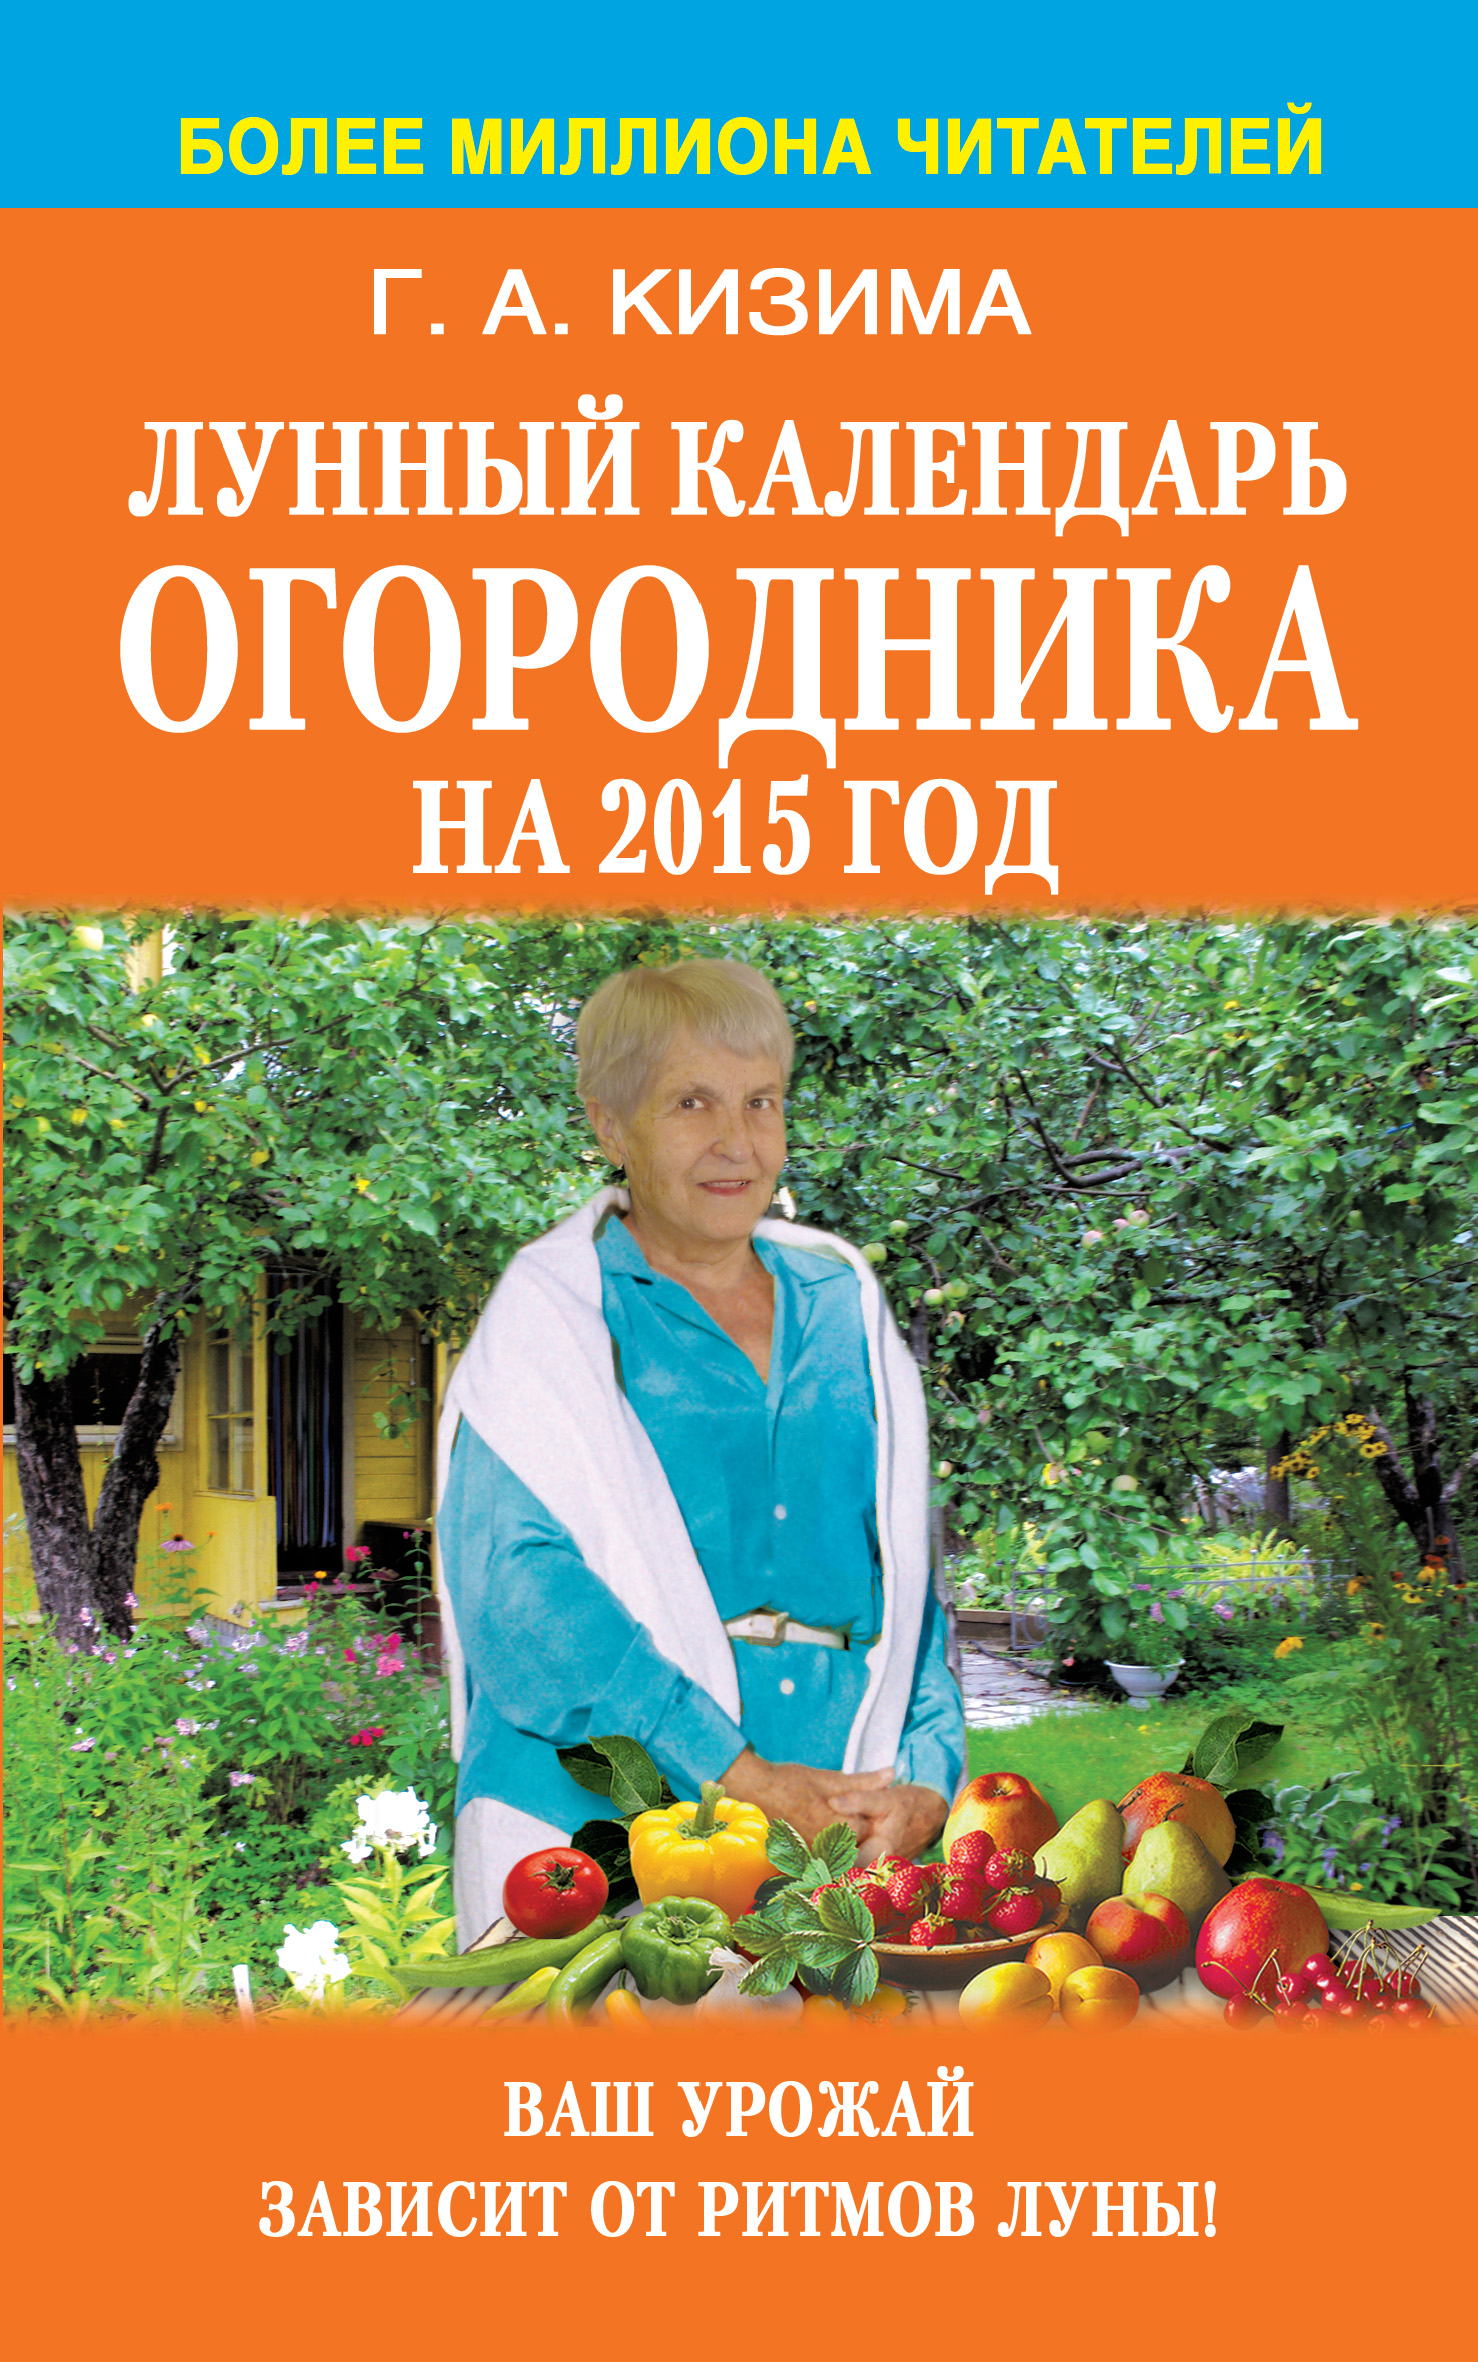 Галина Кизима Лунный календарь огородника на 2015 год цена 2017